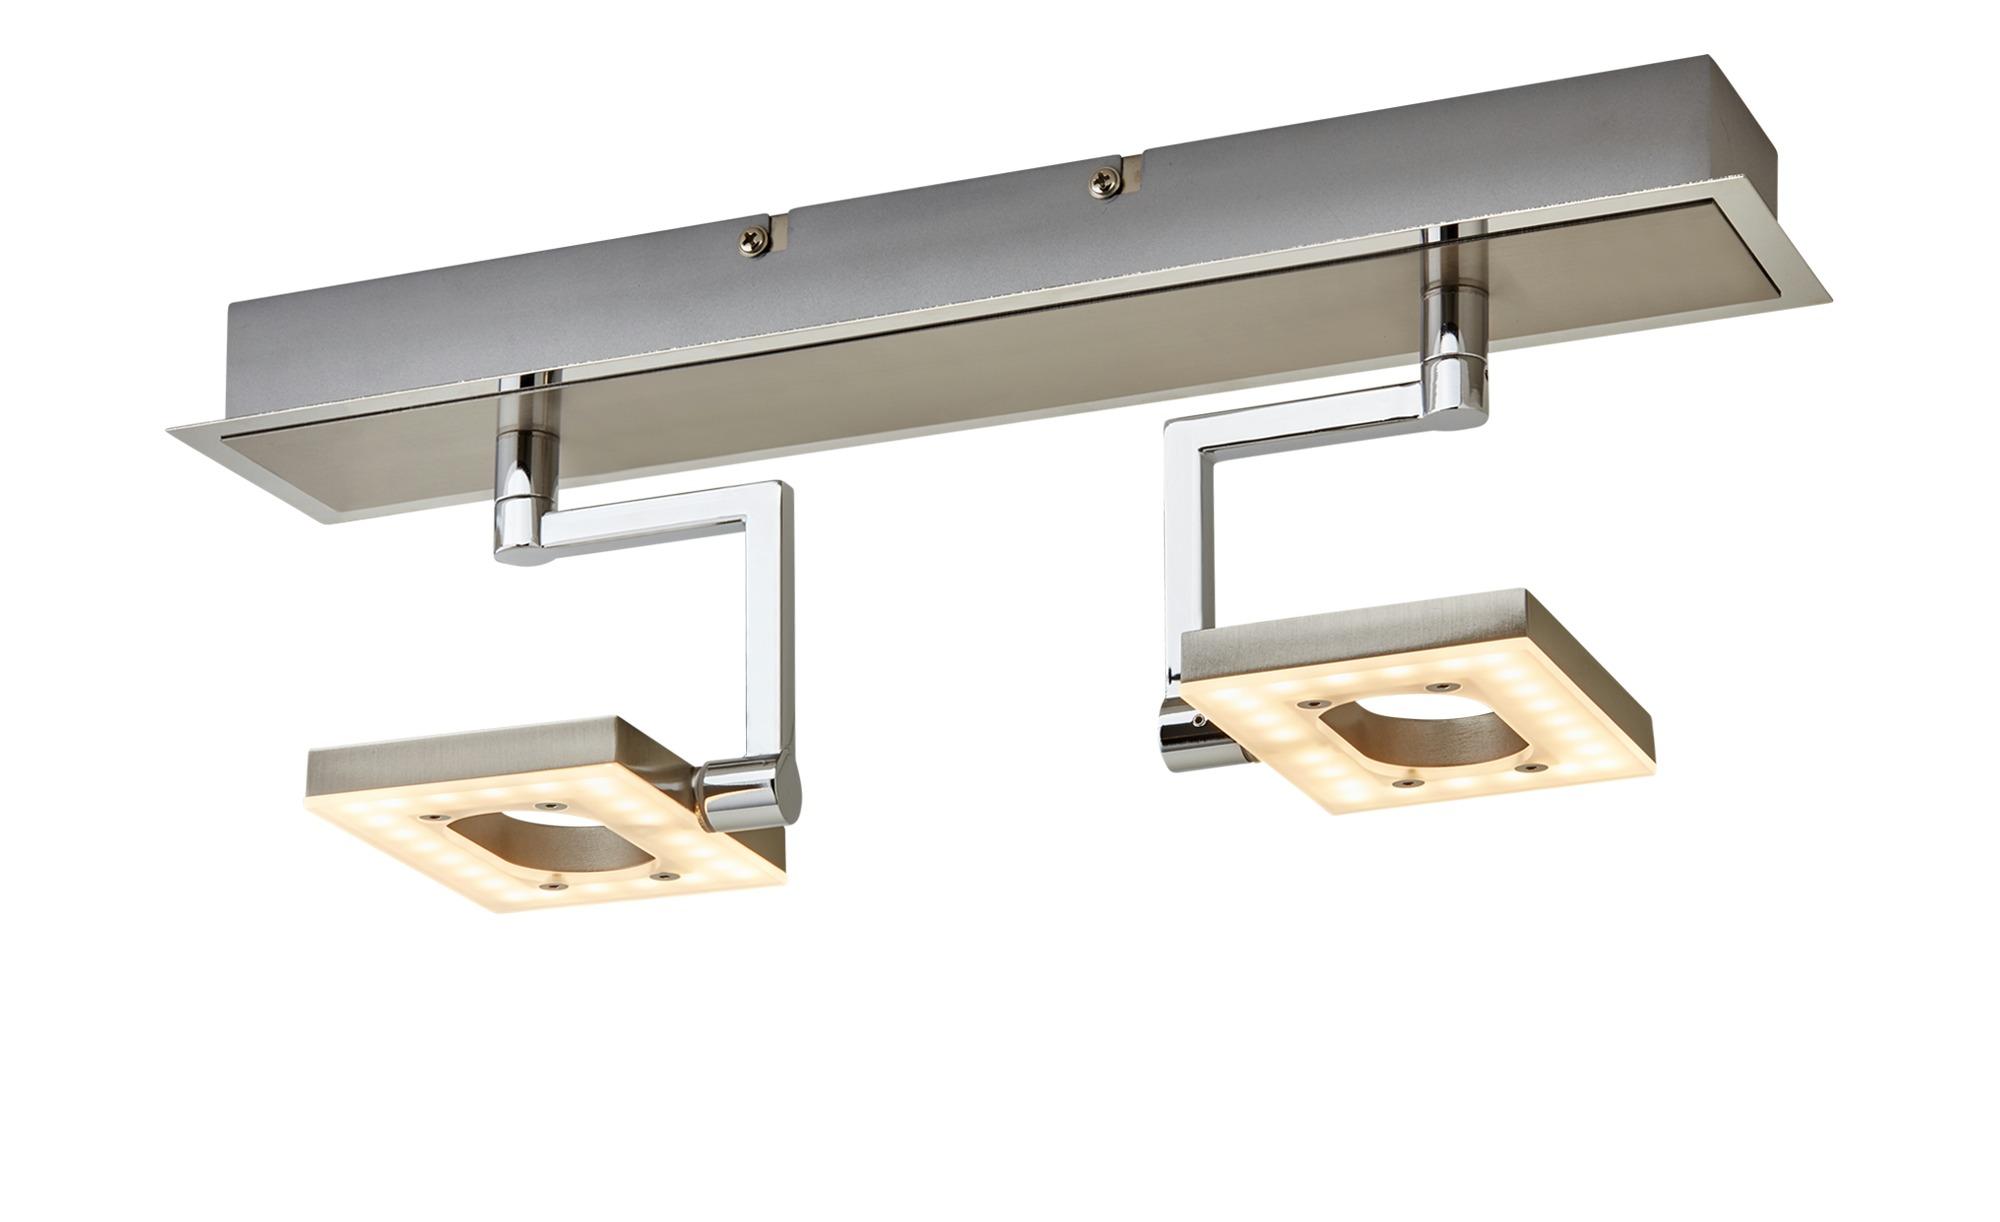 Fischer-Honsel LED- Strahler, 2-flammig, nickel matt, Kopf eckig ¦ silber ¦ Maße (cm): B: 9,5 H: 17,5 Lampen & Leuchten > LED-Leuchten > LED-Strahler & Spots - Höffner